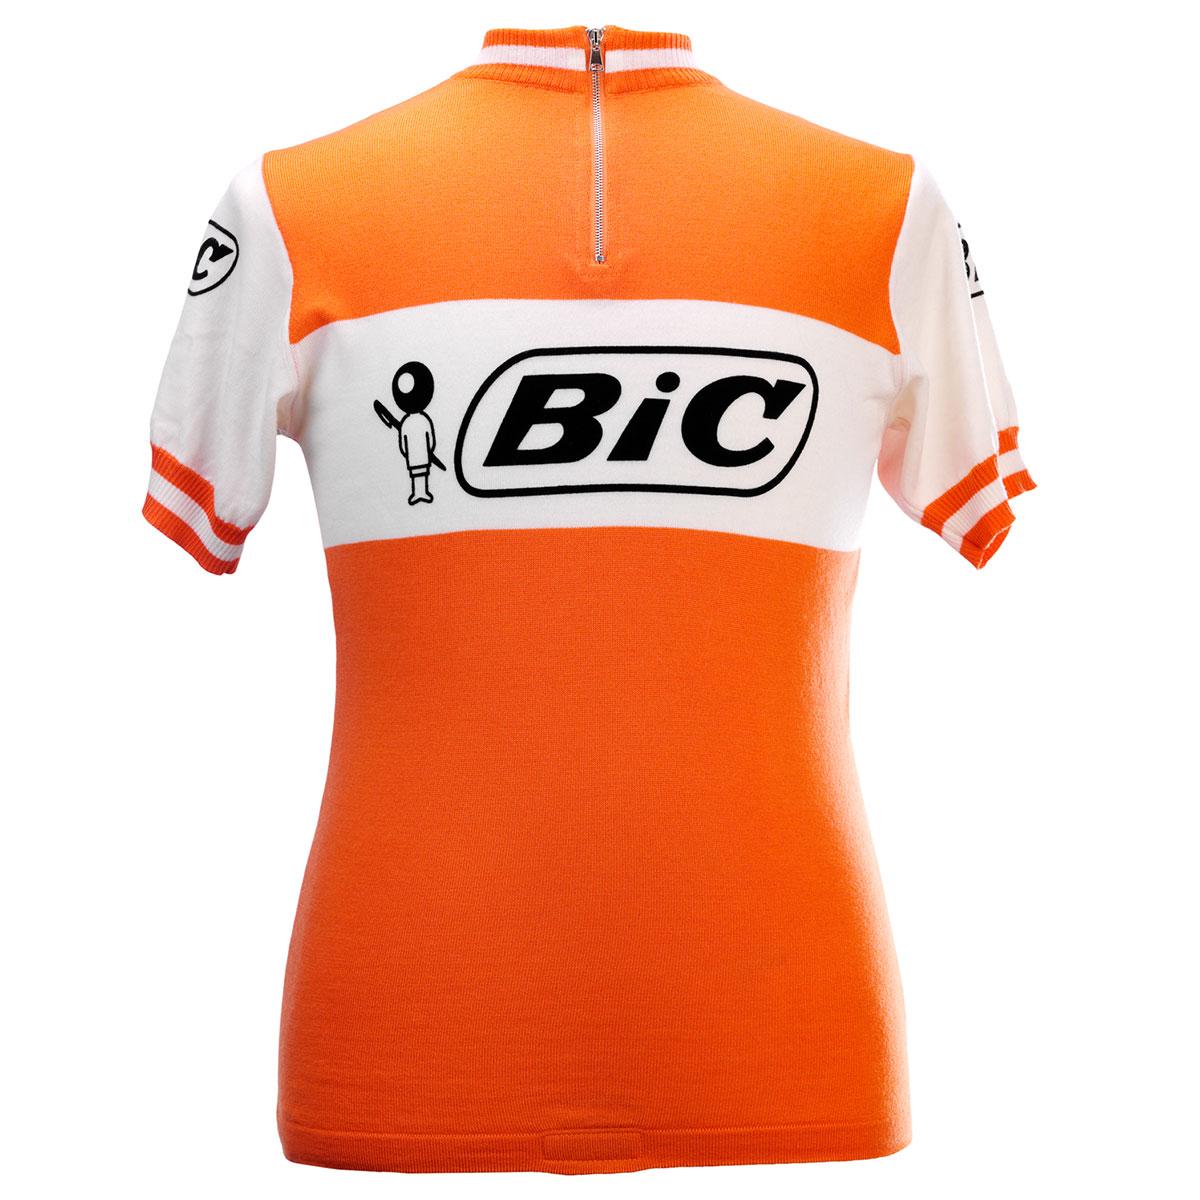 BIC Vélo Jersey Rétro Vintage Bikes Shirt Taille XL Cool Bike Jersey cycling shirt